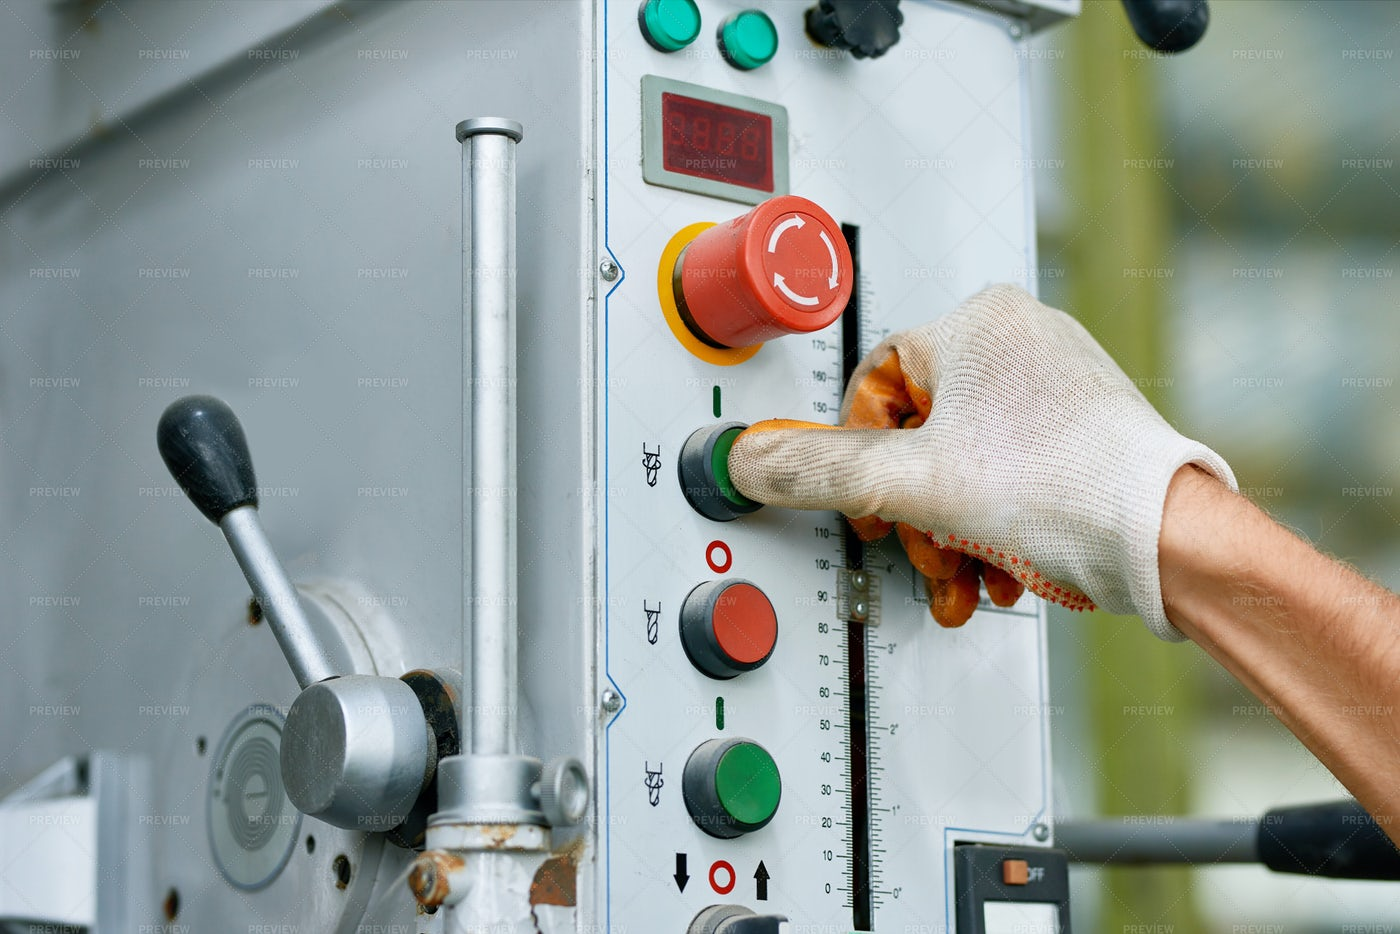 Machine Control Panel At Factory: Stock Photos